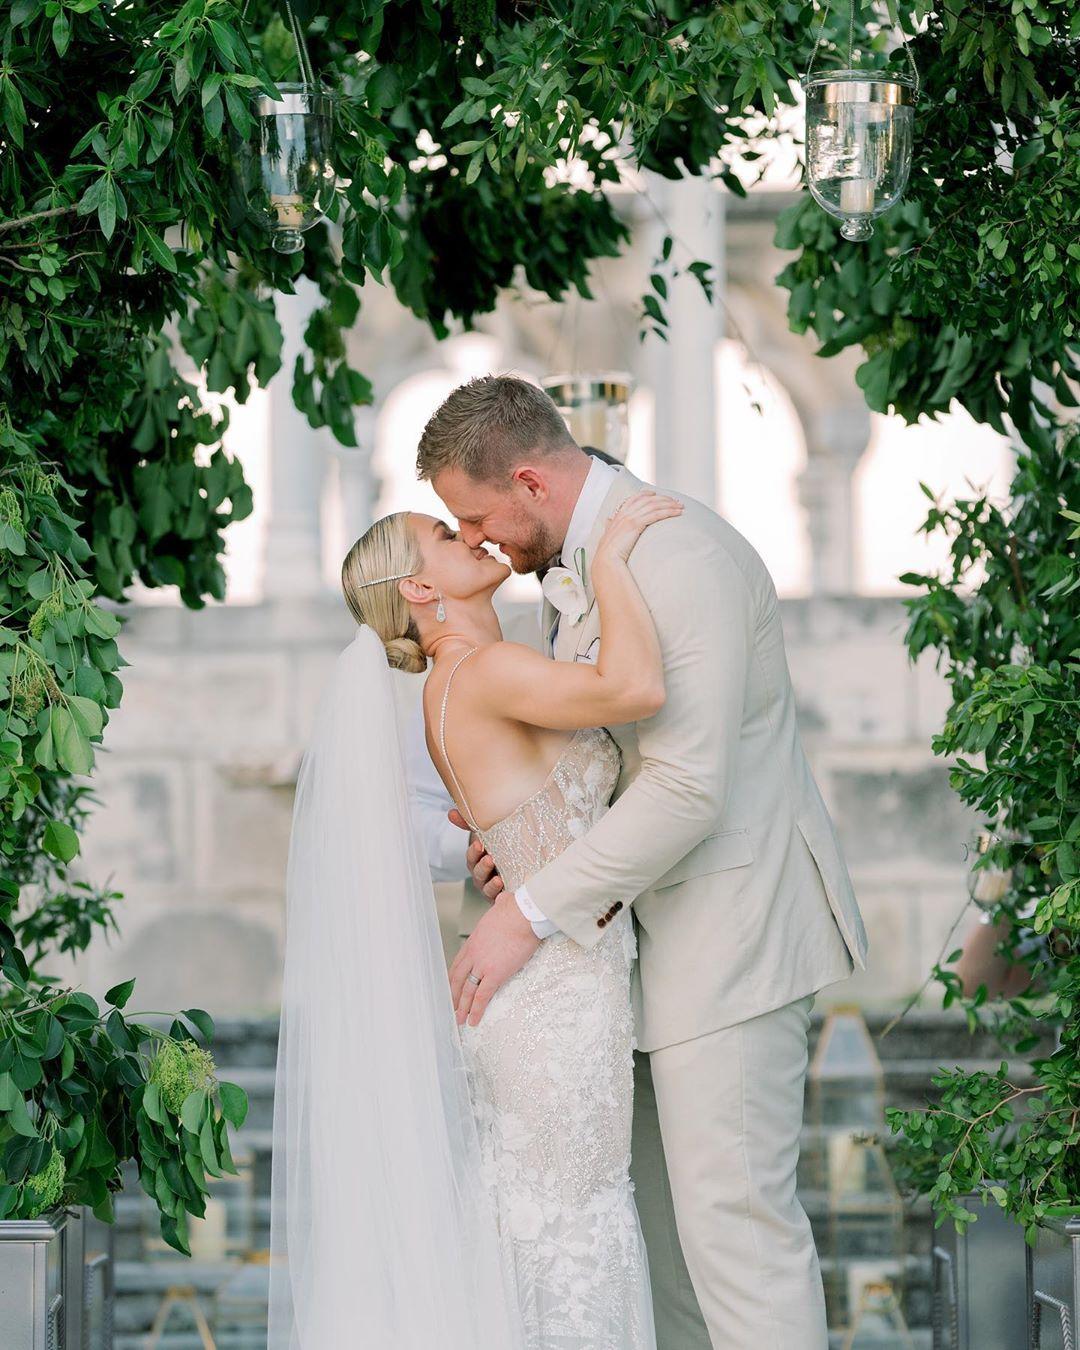 Watt a beautiful wedding